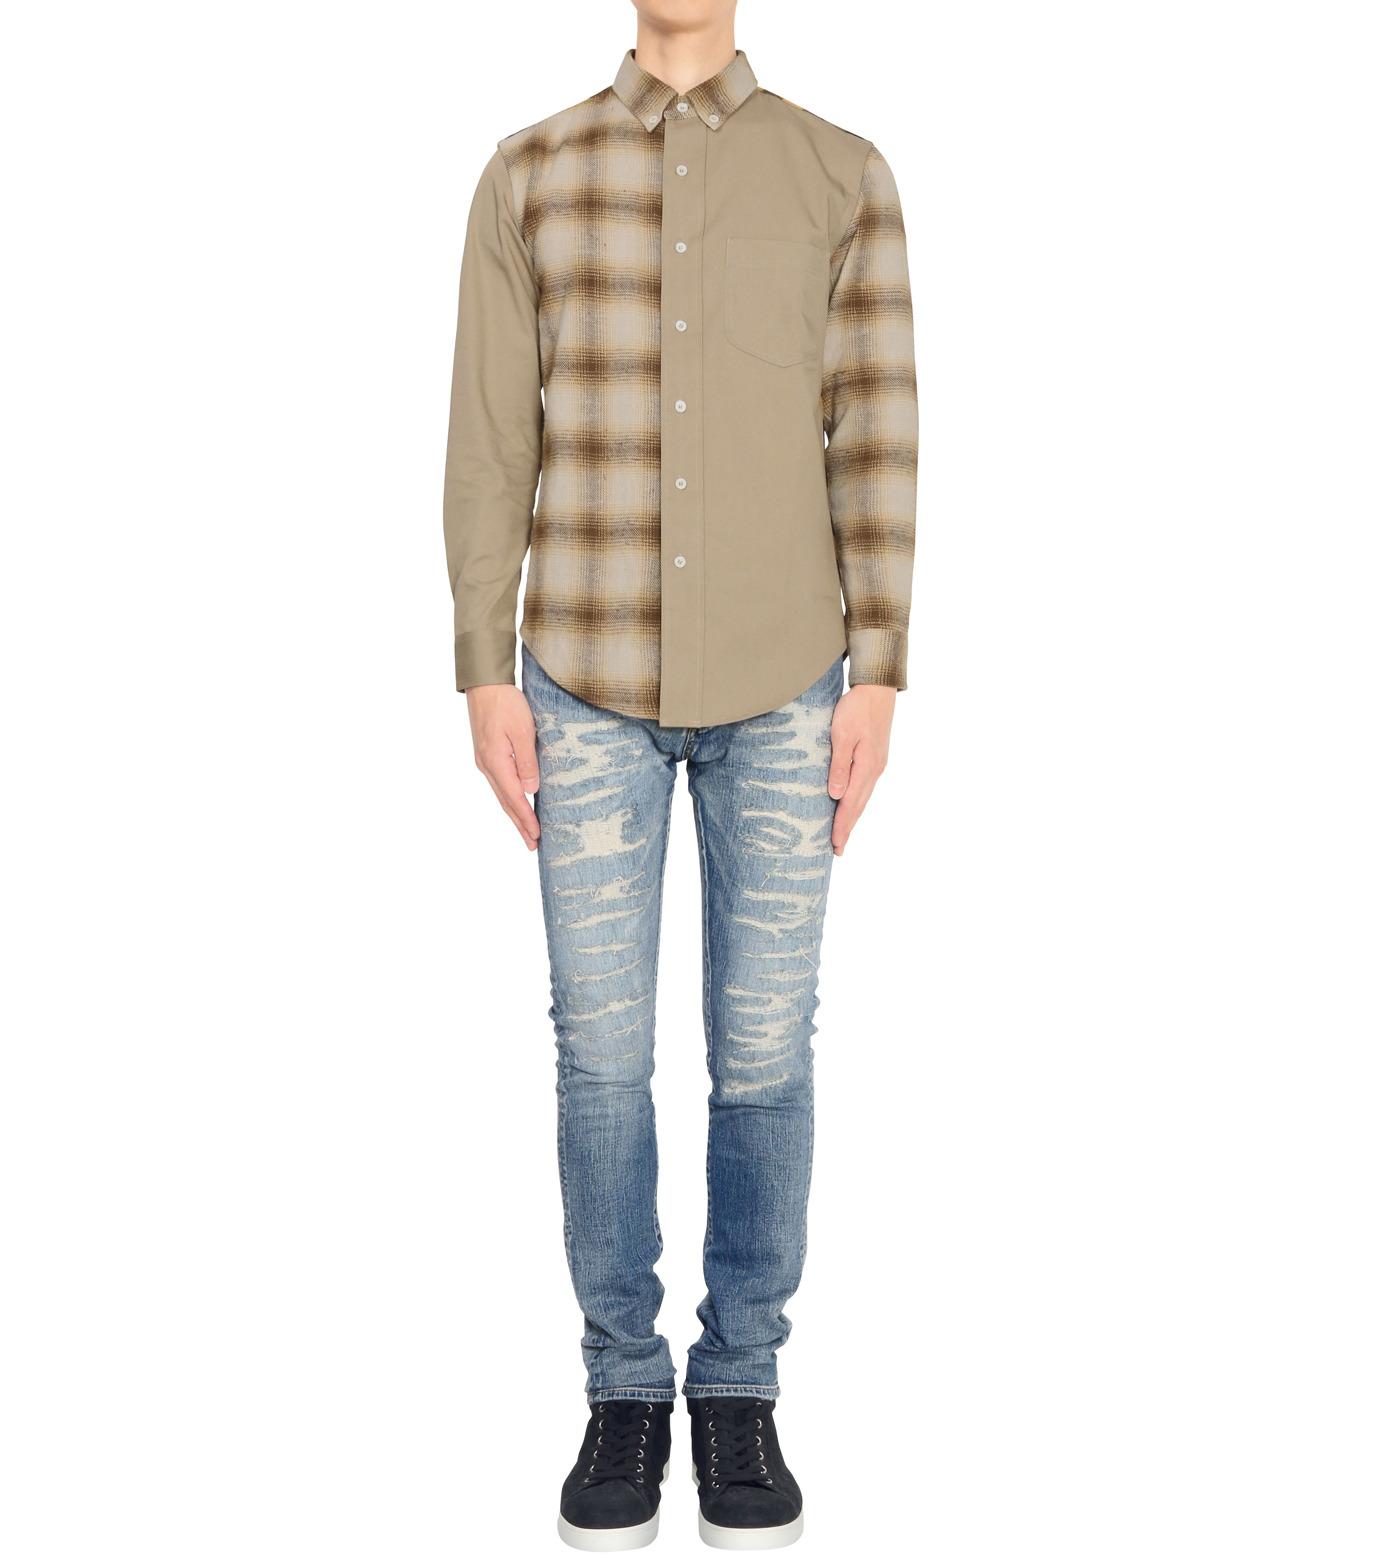 PALM ANGELS(パーム・エンジェルス)のPATCHWORK SHIRT-GREEN(シャツ/shirt)-6093055-22 拡大詳細画像3